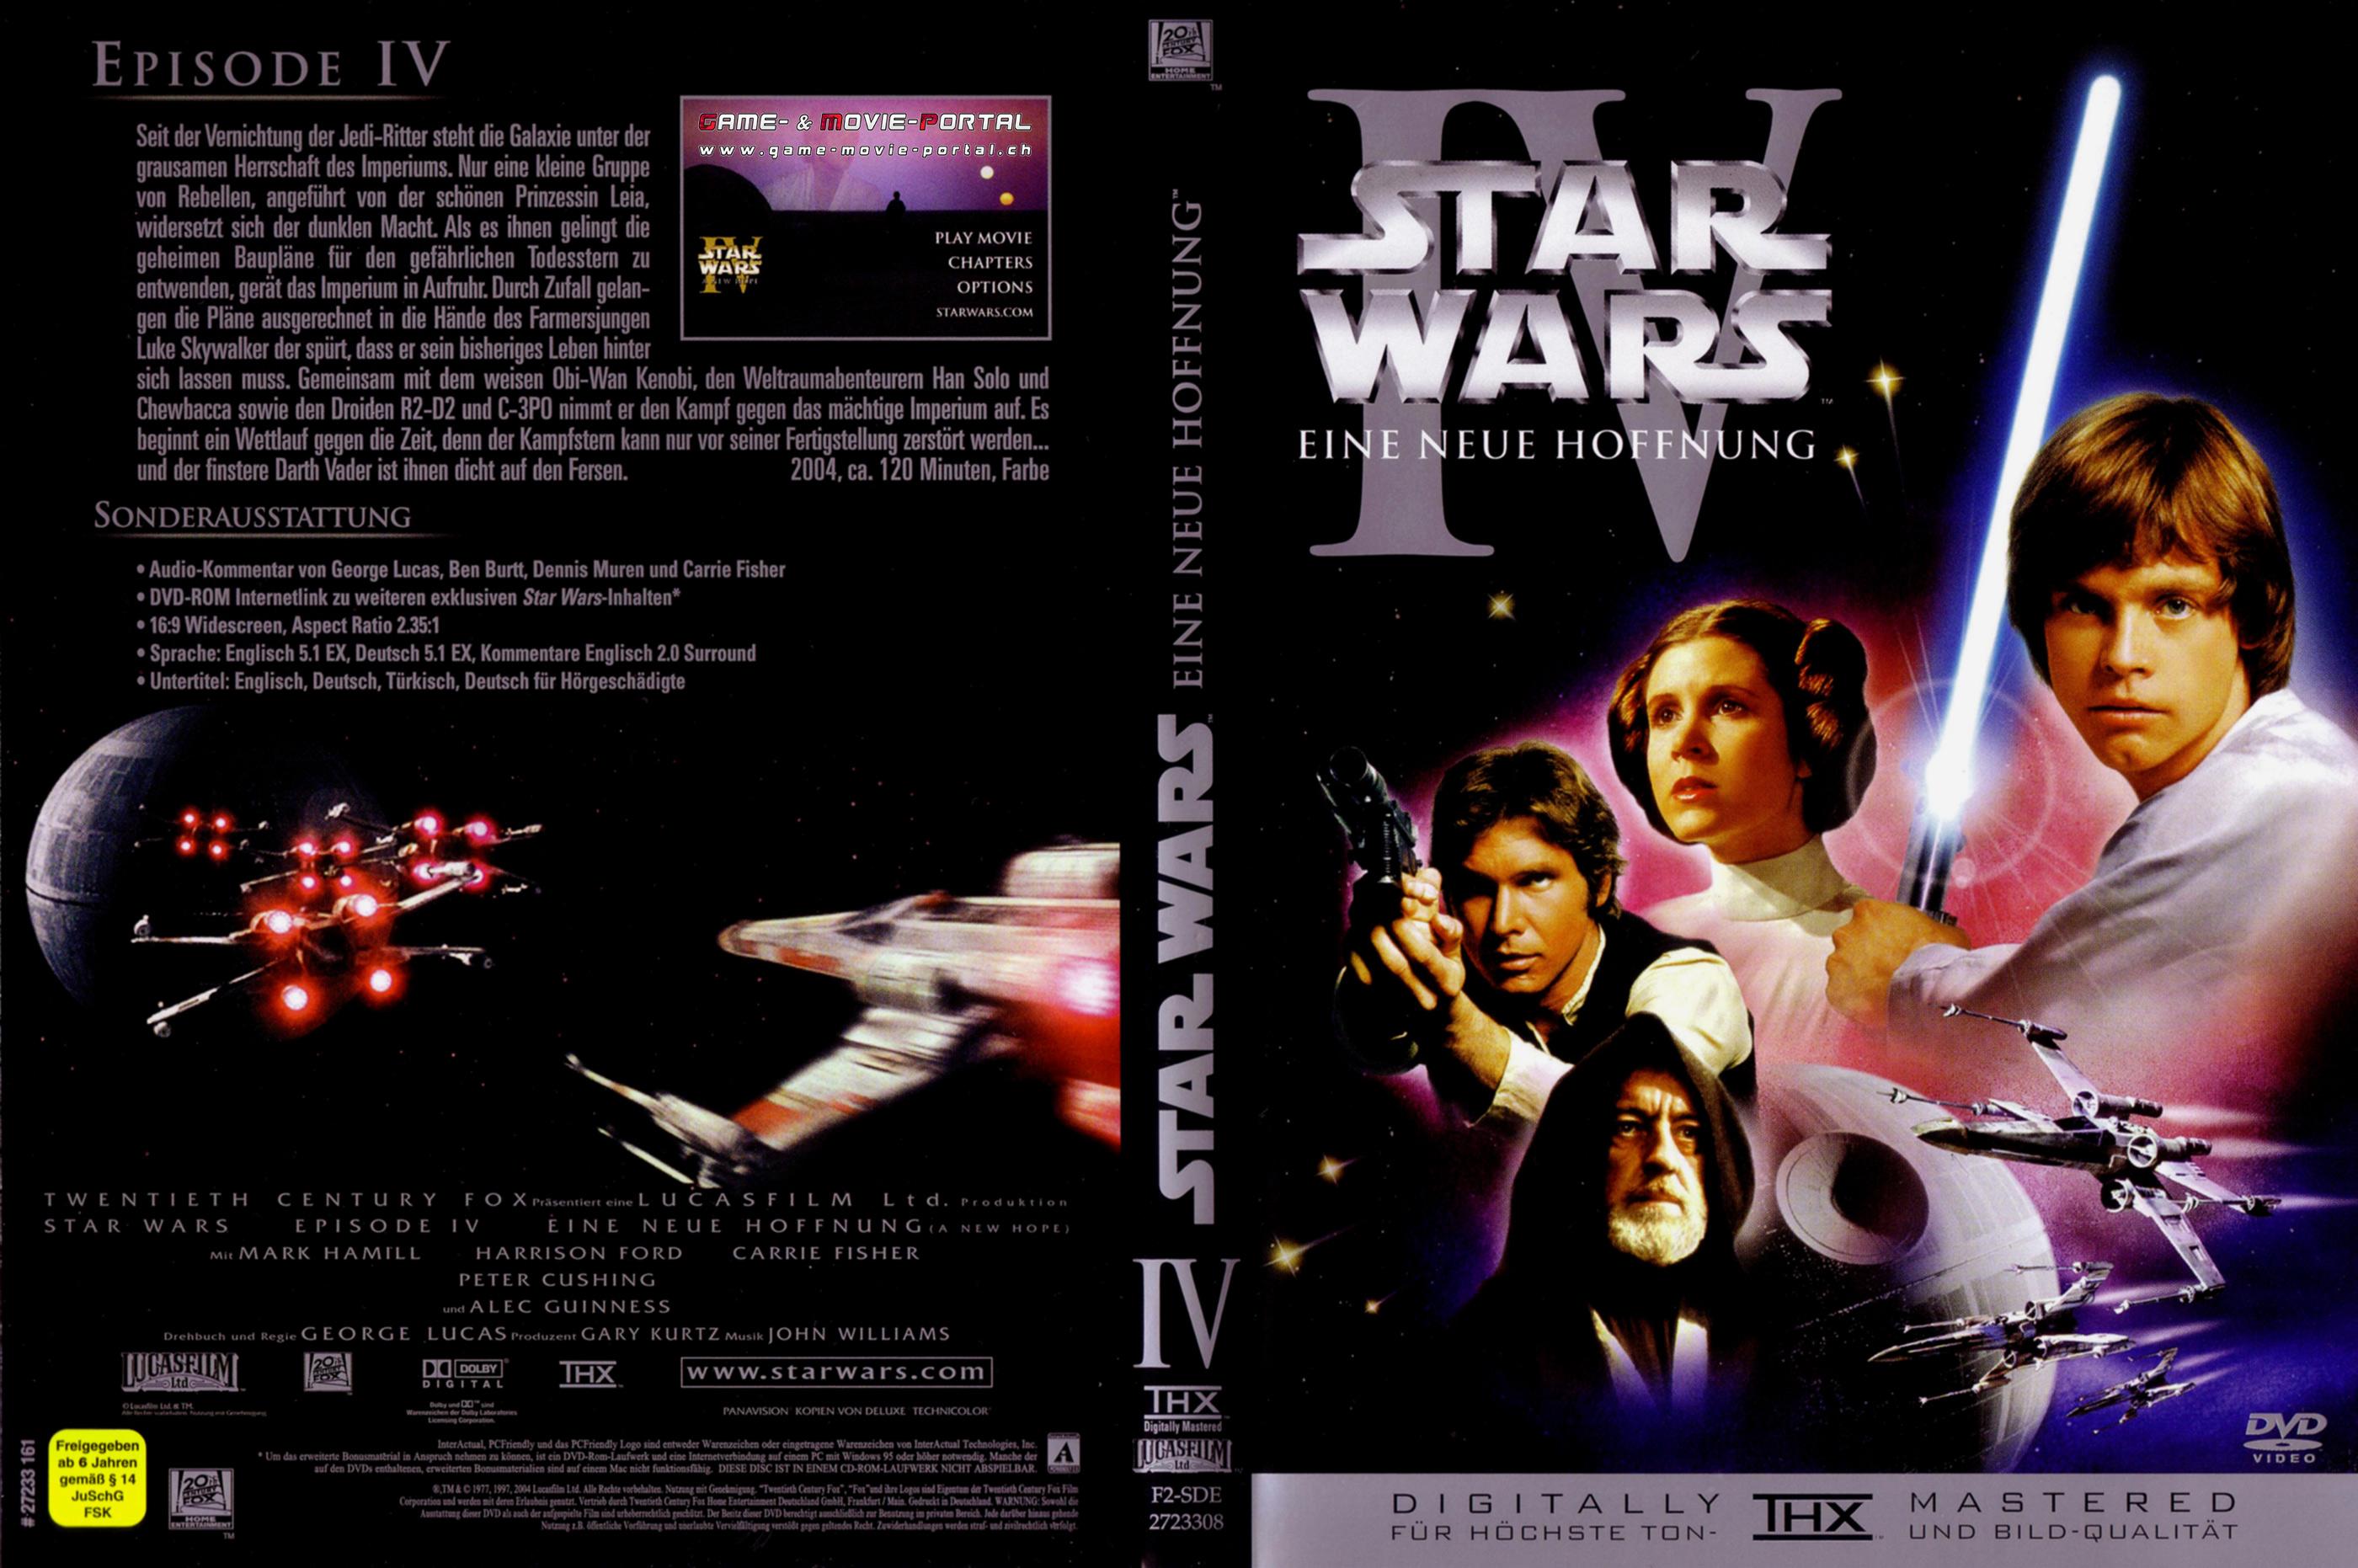 star wars iv stream